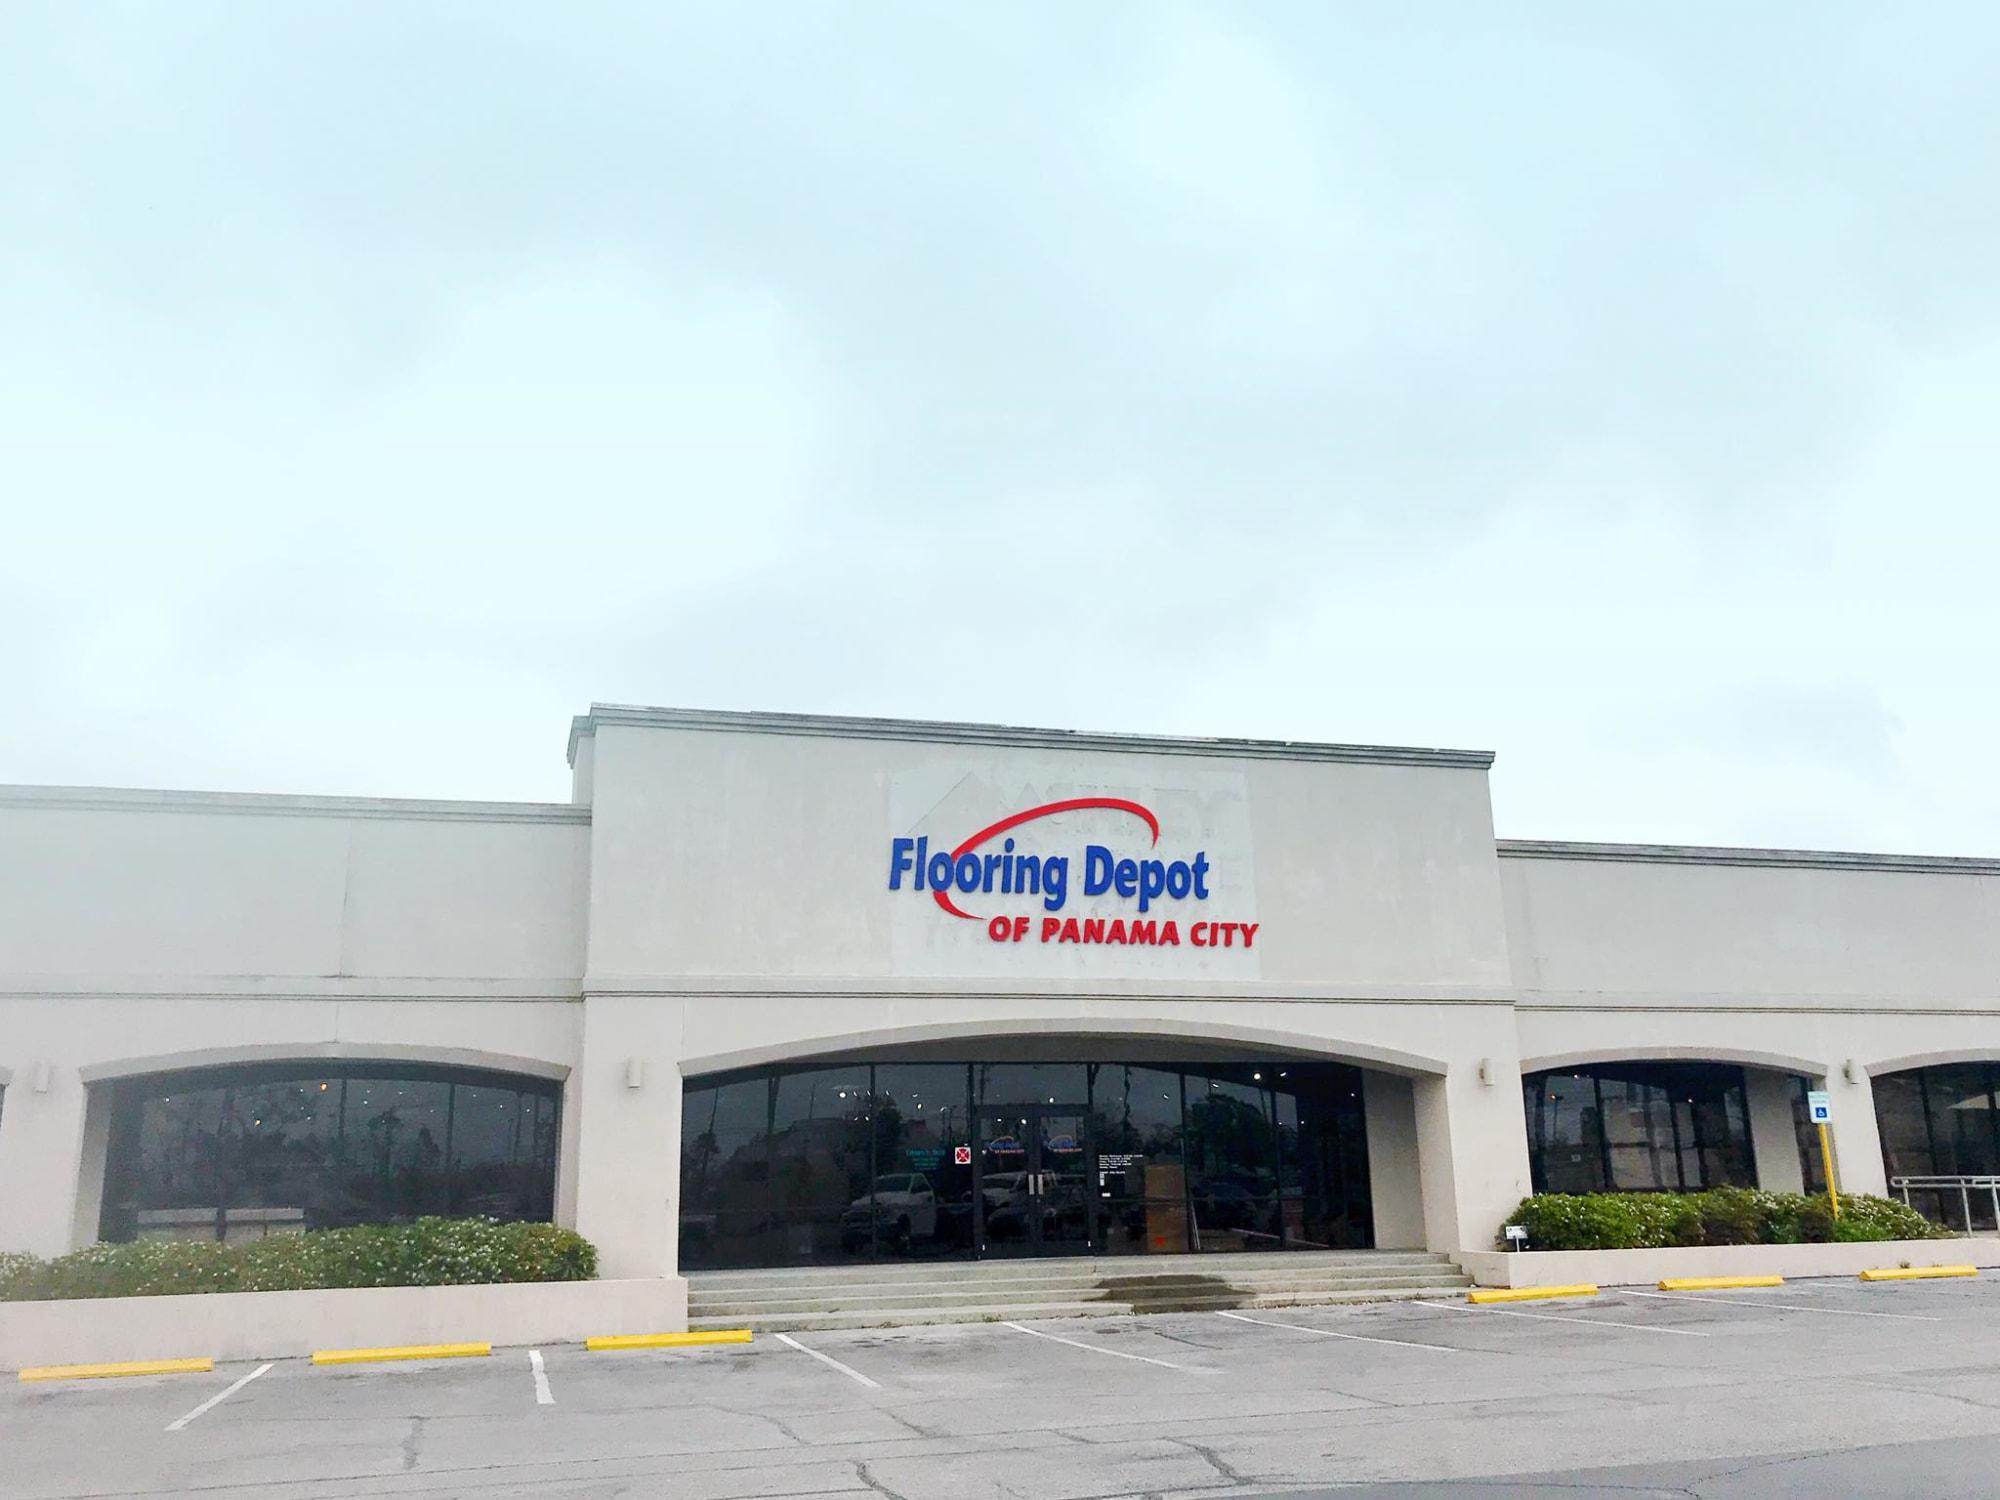 Flooring Depot of Panama City - 1310 15th St Panama City, FL 32405